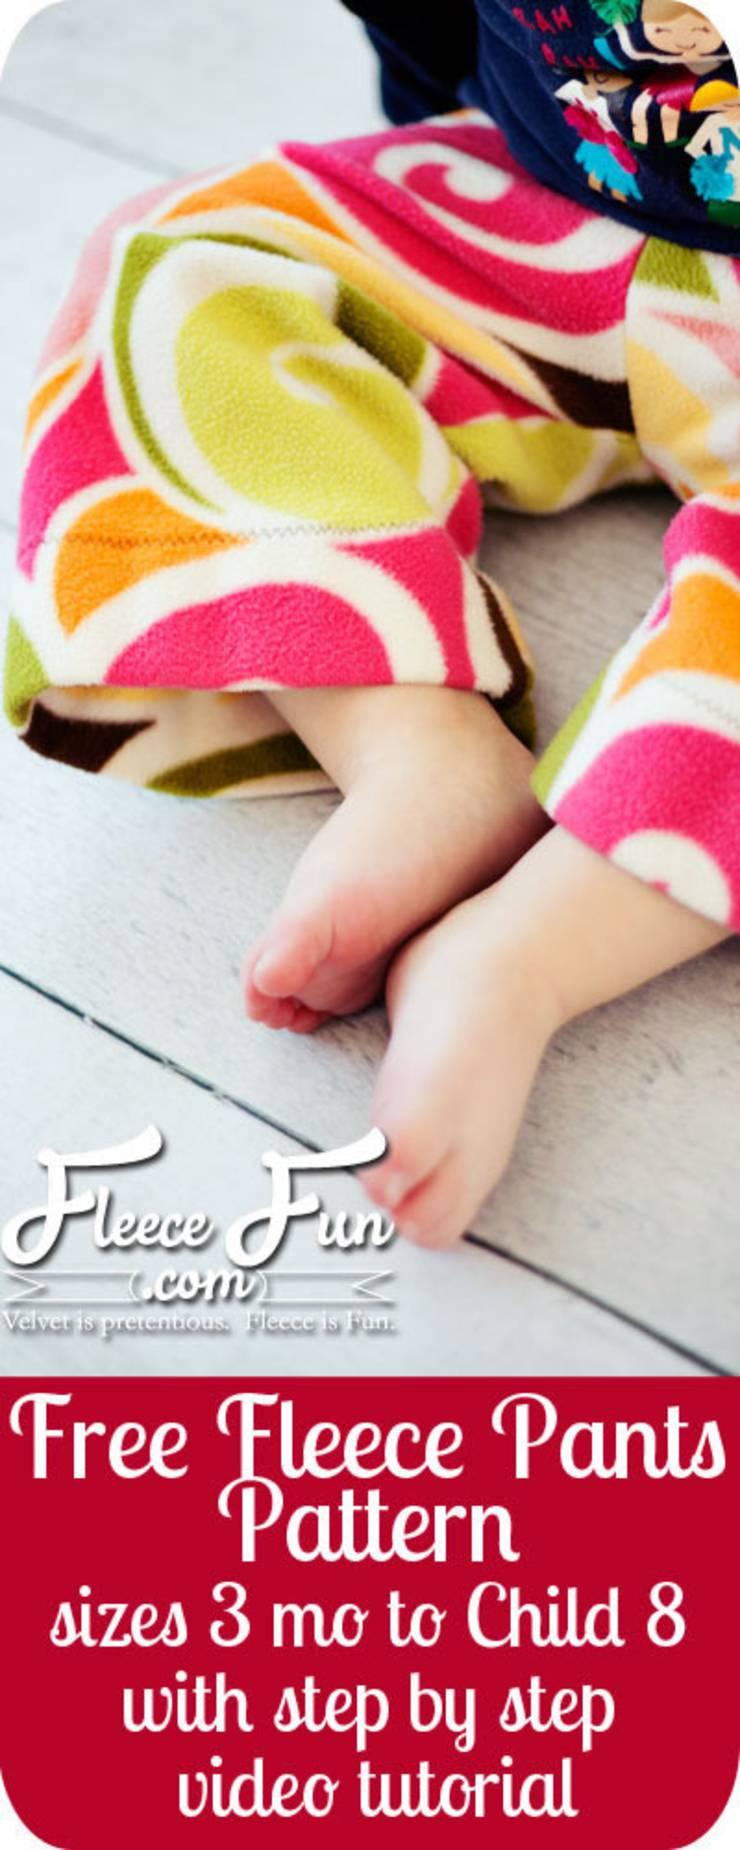 Fleece Pajama Pants Pattern